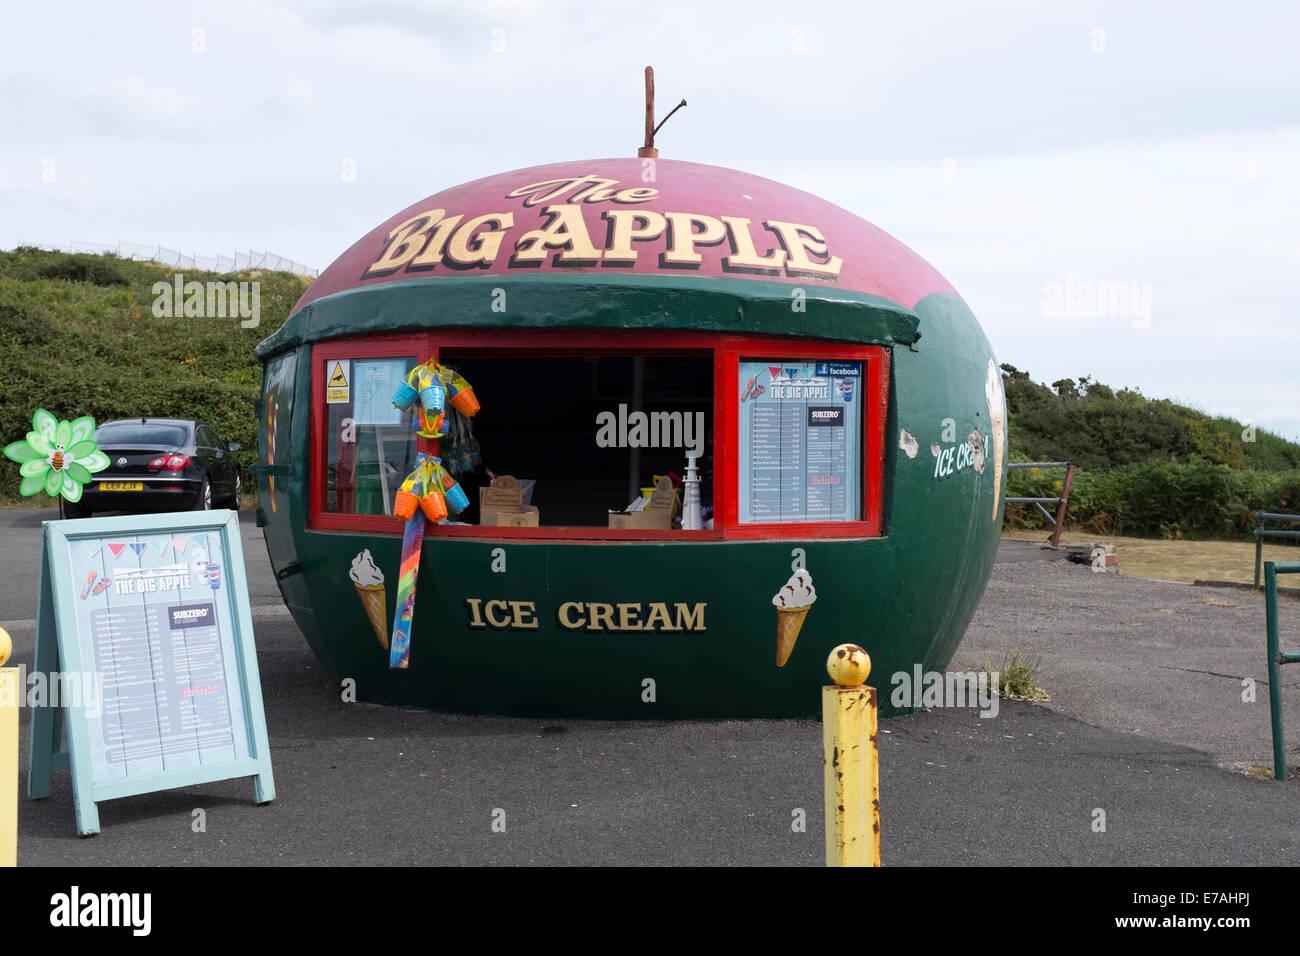 La Big Apple New York Stand Ice Cream Shop Stall Photo Stock